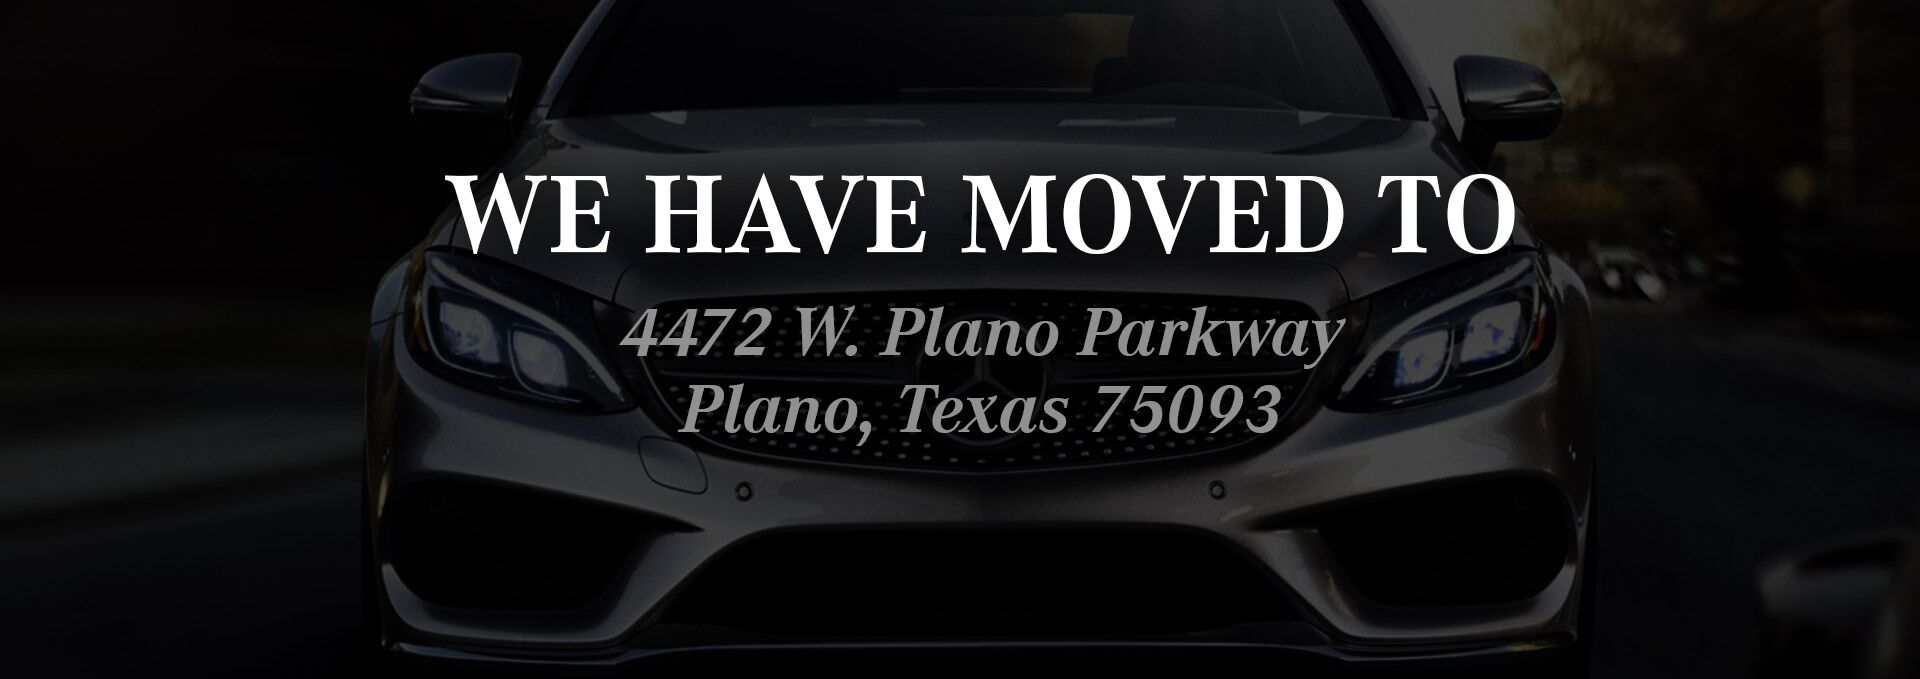 Pre Owned Luxury Car Dealership Plano Tx Autos Of Dallas